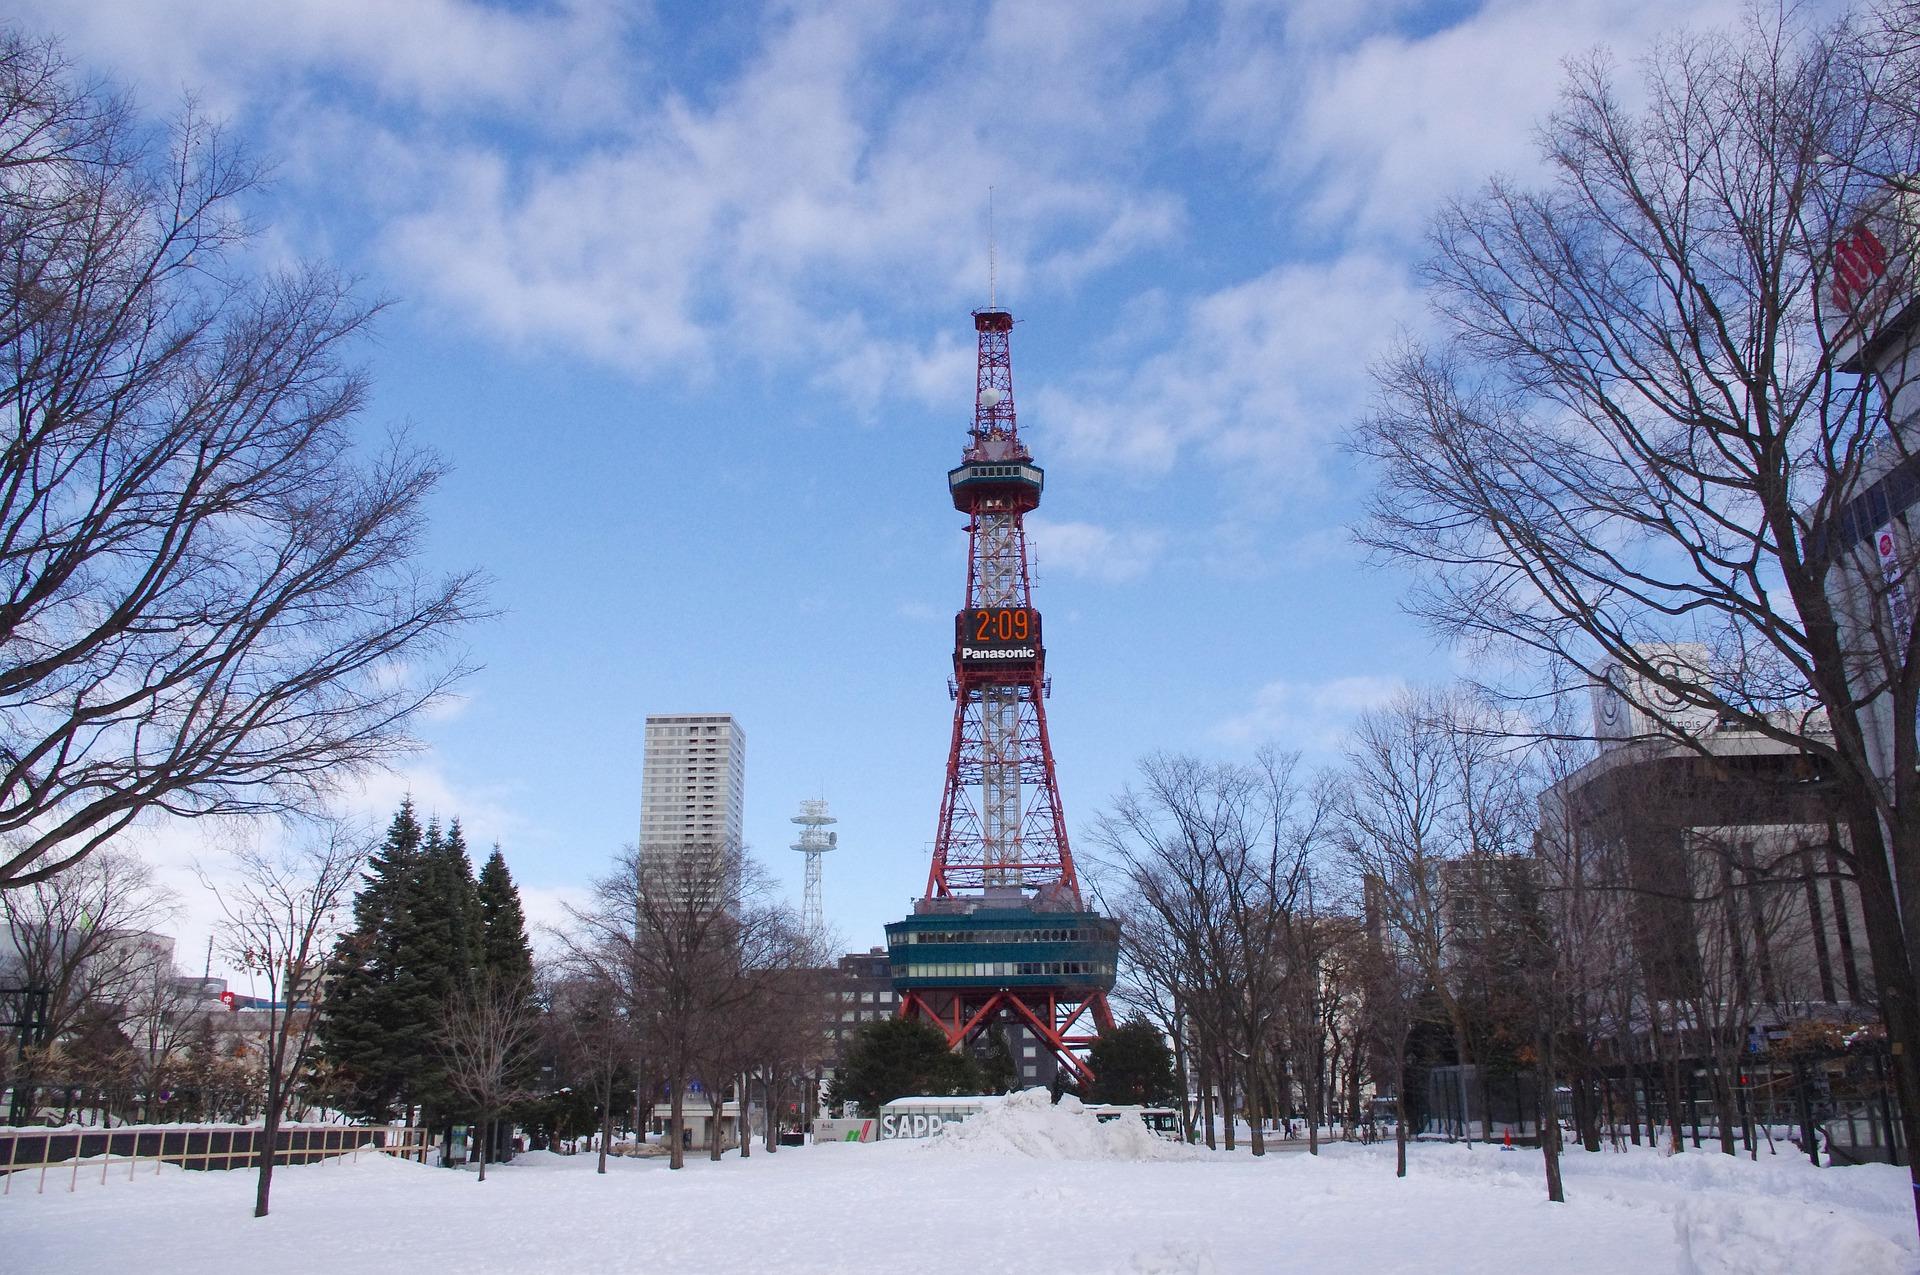 7UP Cherry Tomato. Sapporo City